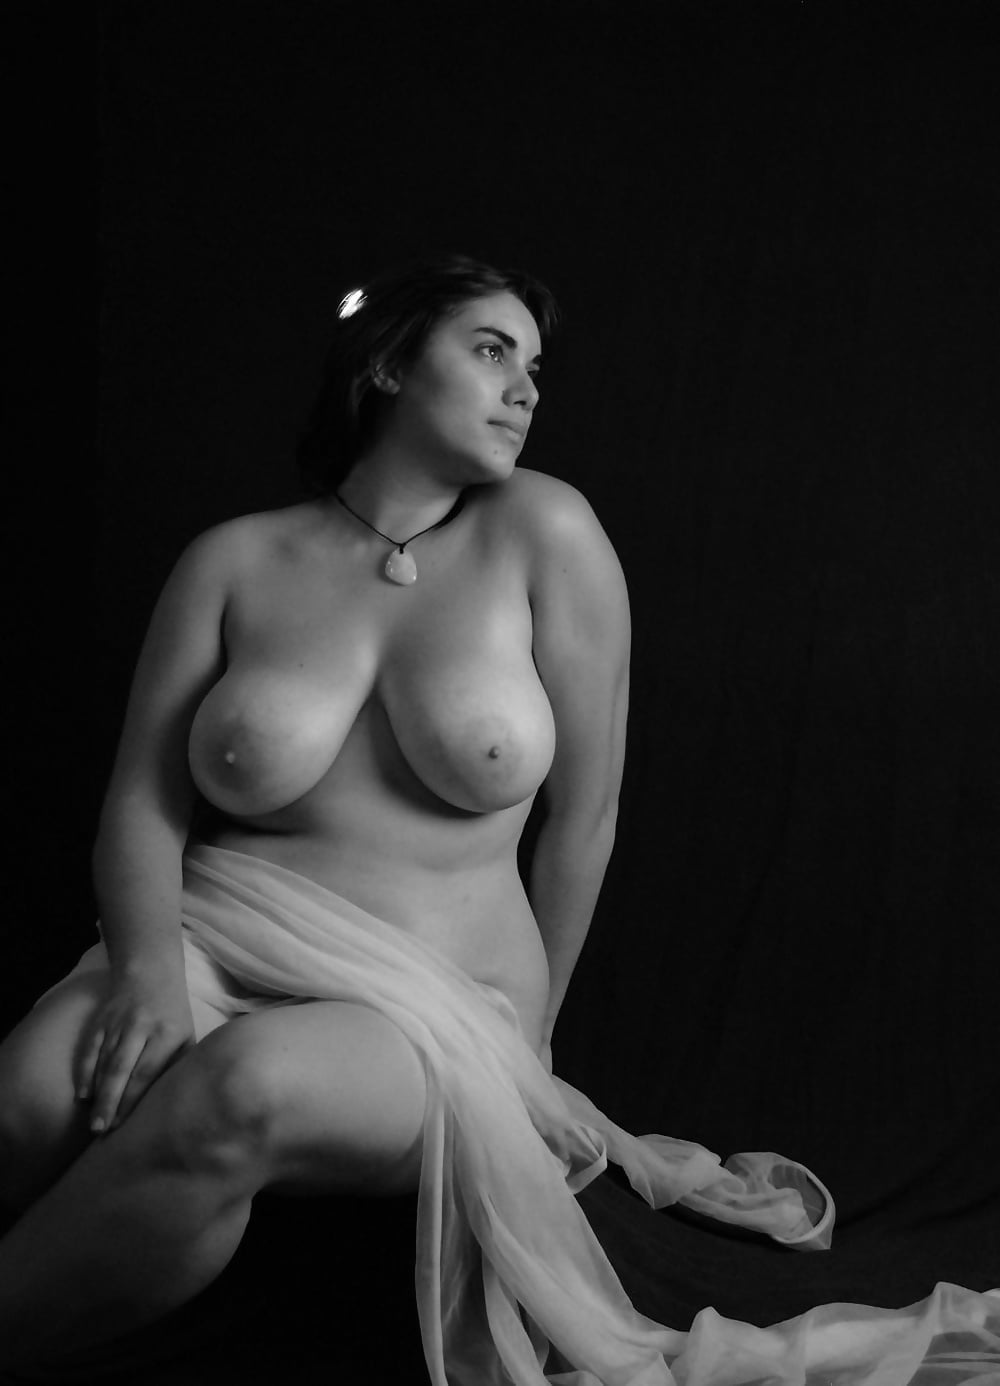 Curvy Nude Ladies And Nude Women Photos